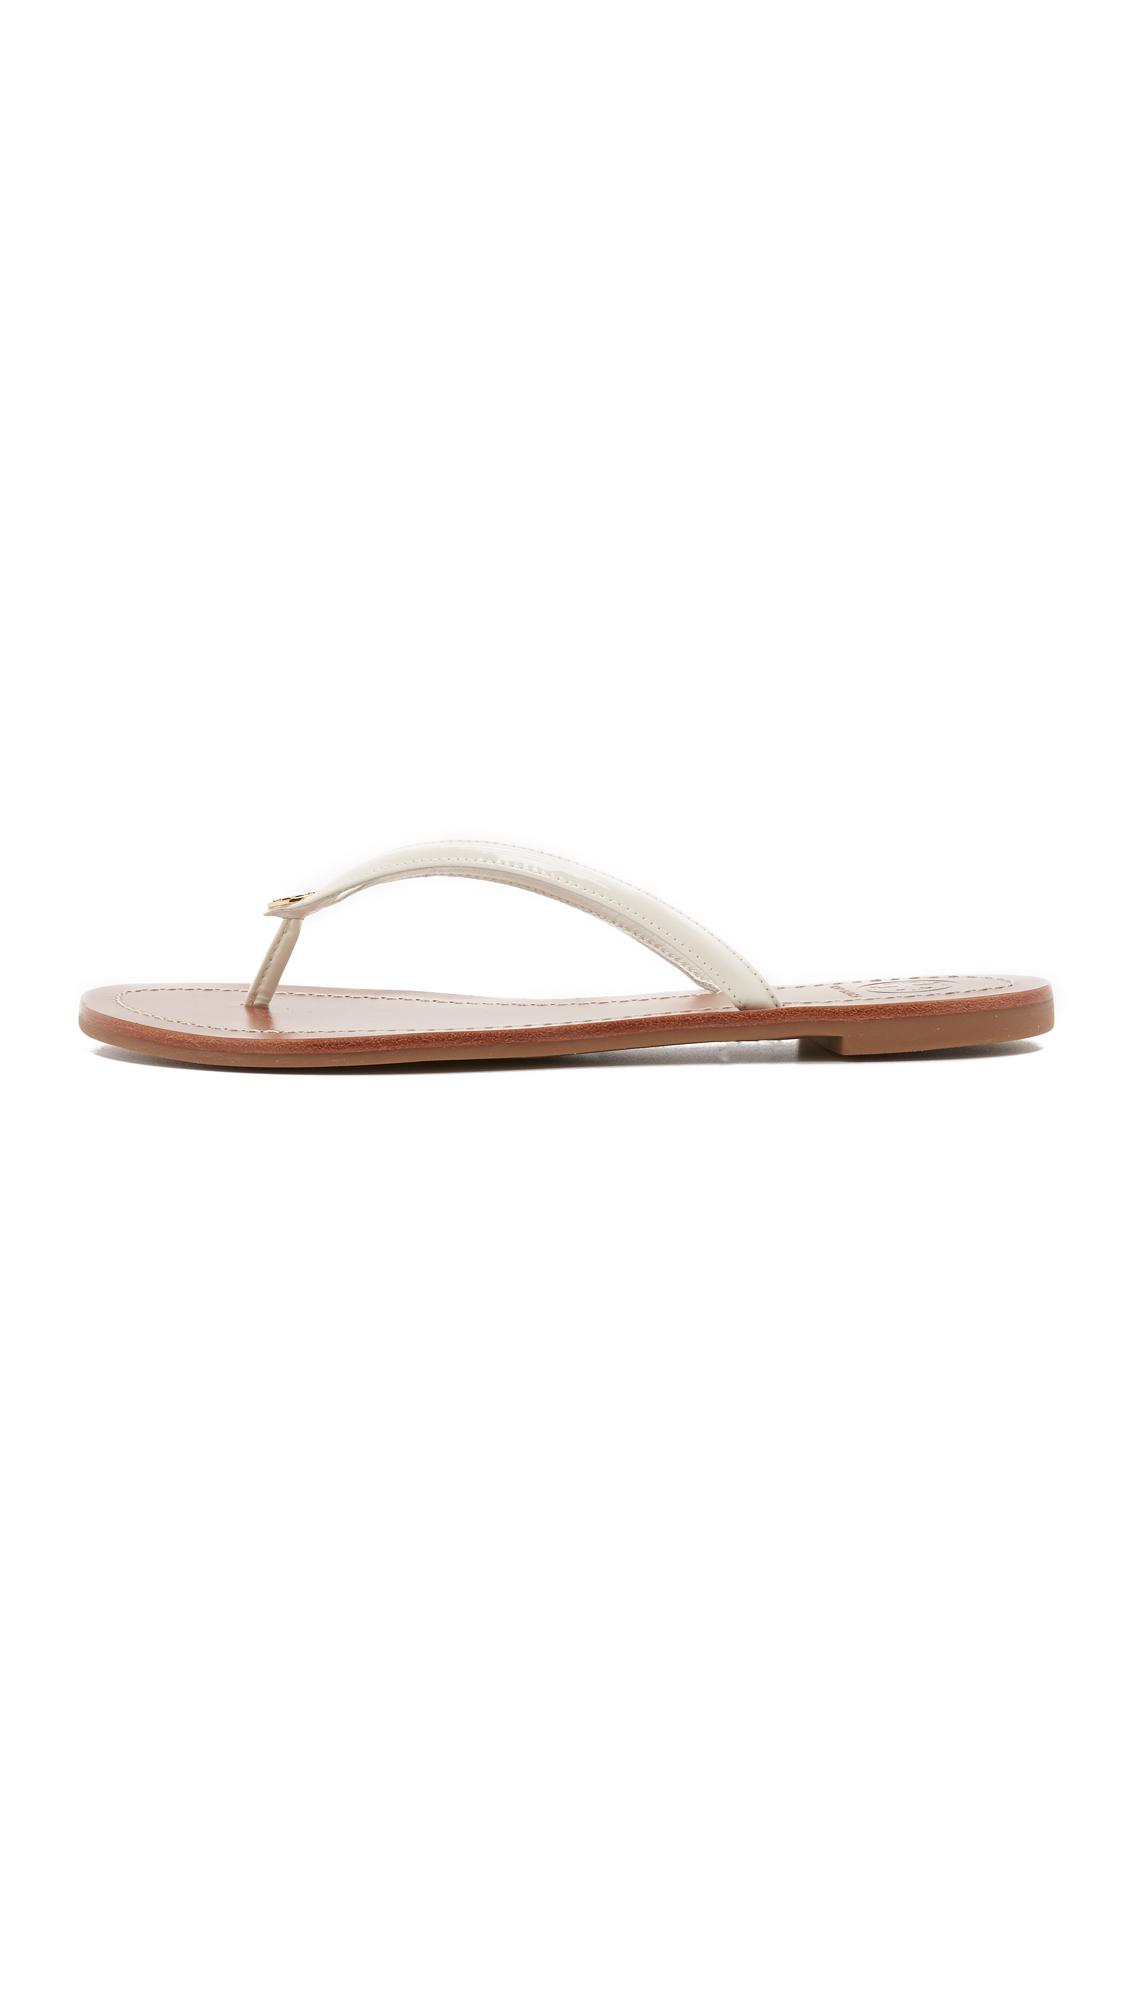 baed0344dda470 Tory Burch Terra Thong Sandals